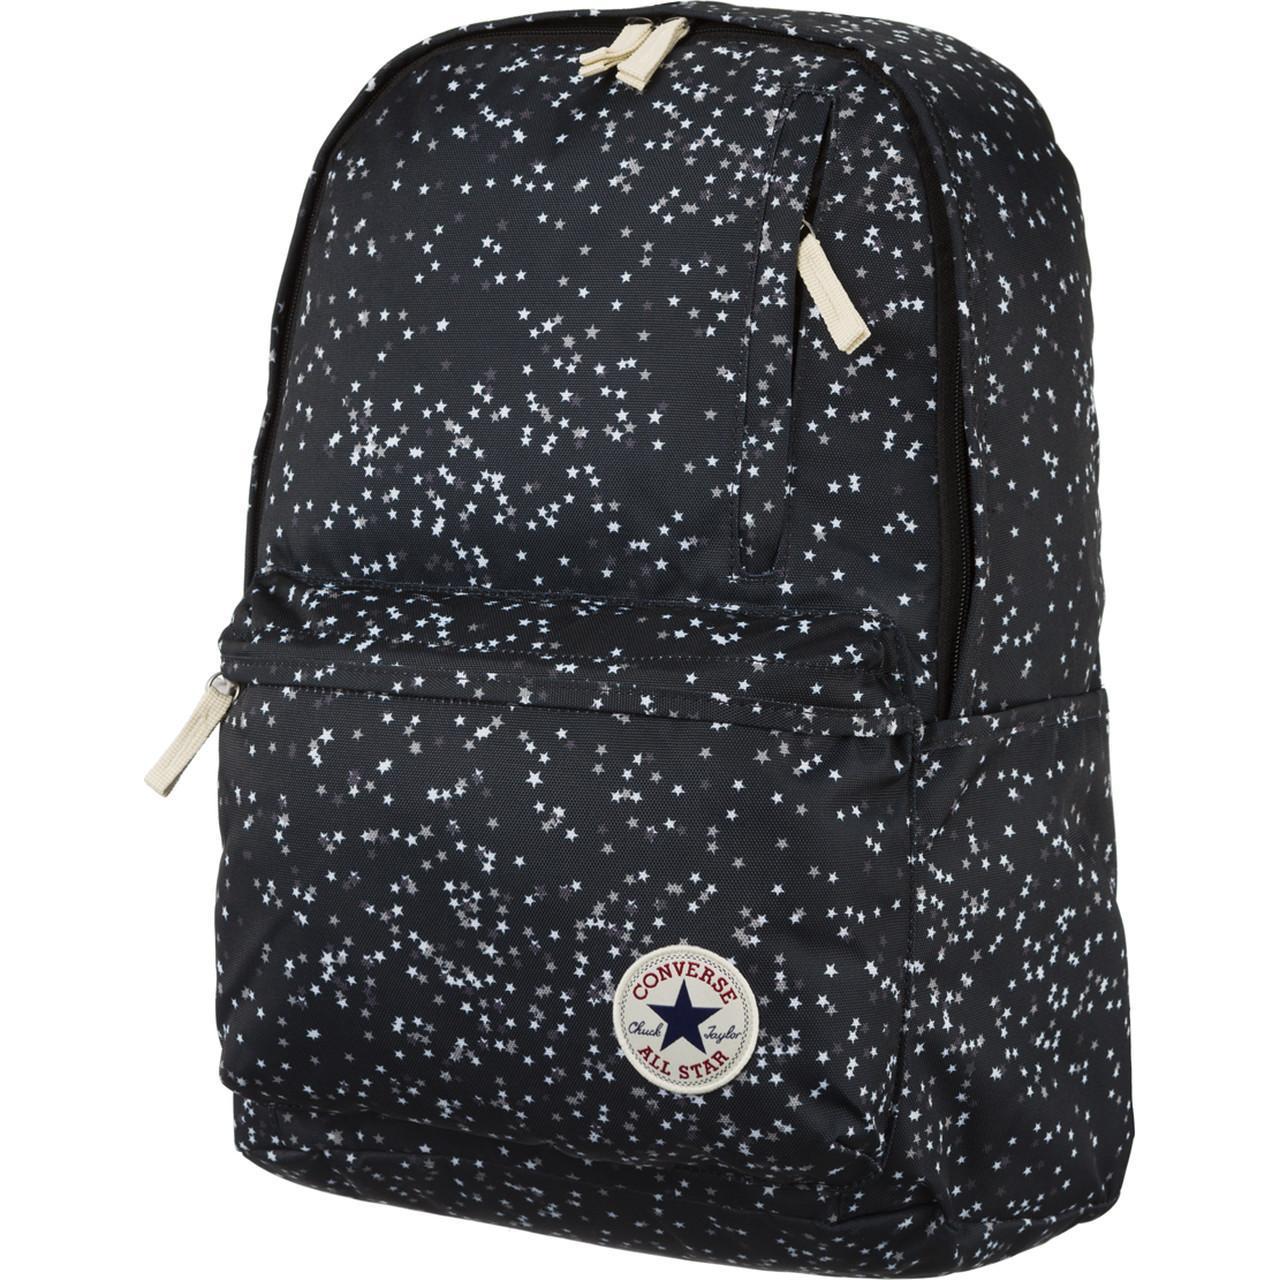 b277f73e27 Рюкзак Converse Core Original Backpack Teeny Star Multi (10002532-A01) -  Интернет магазин